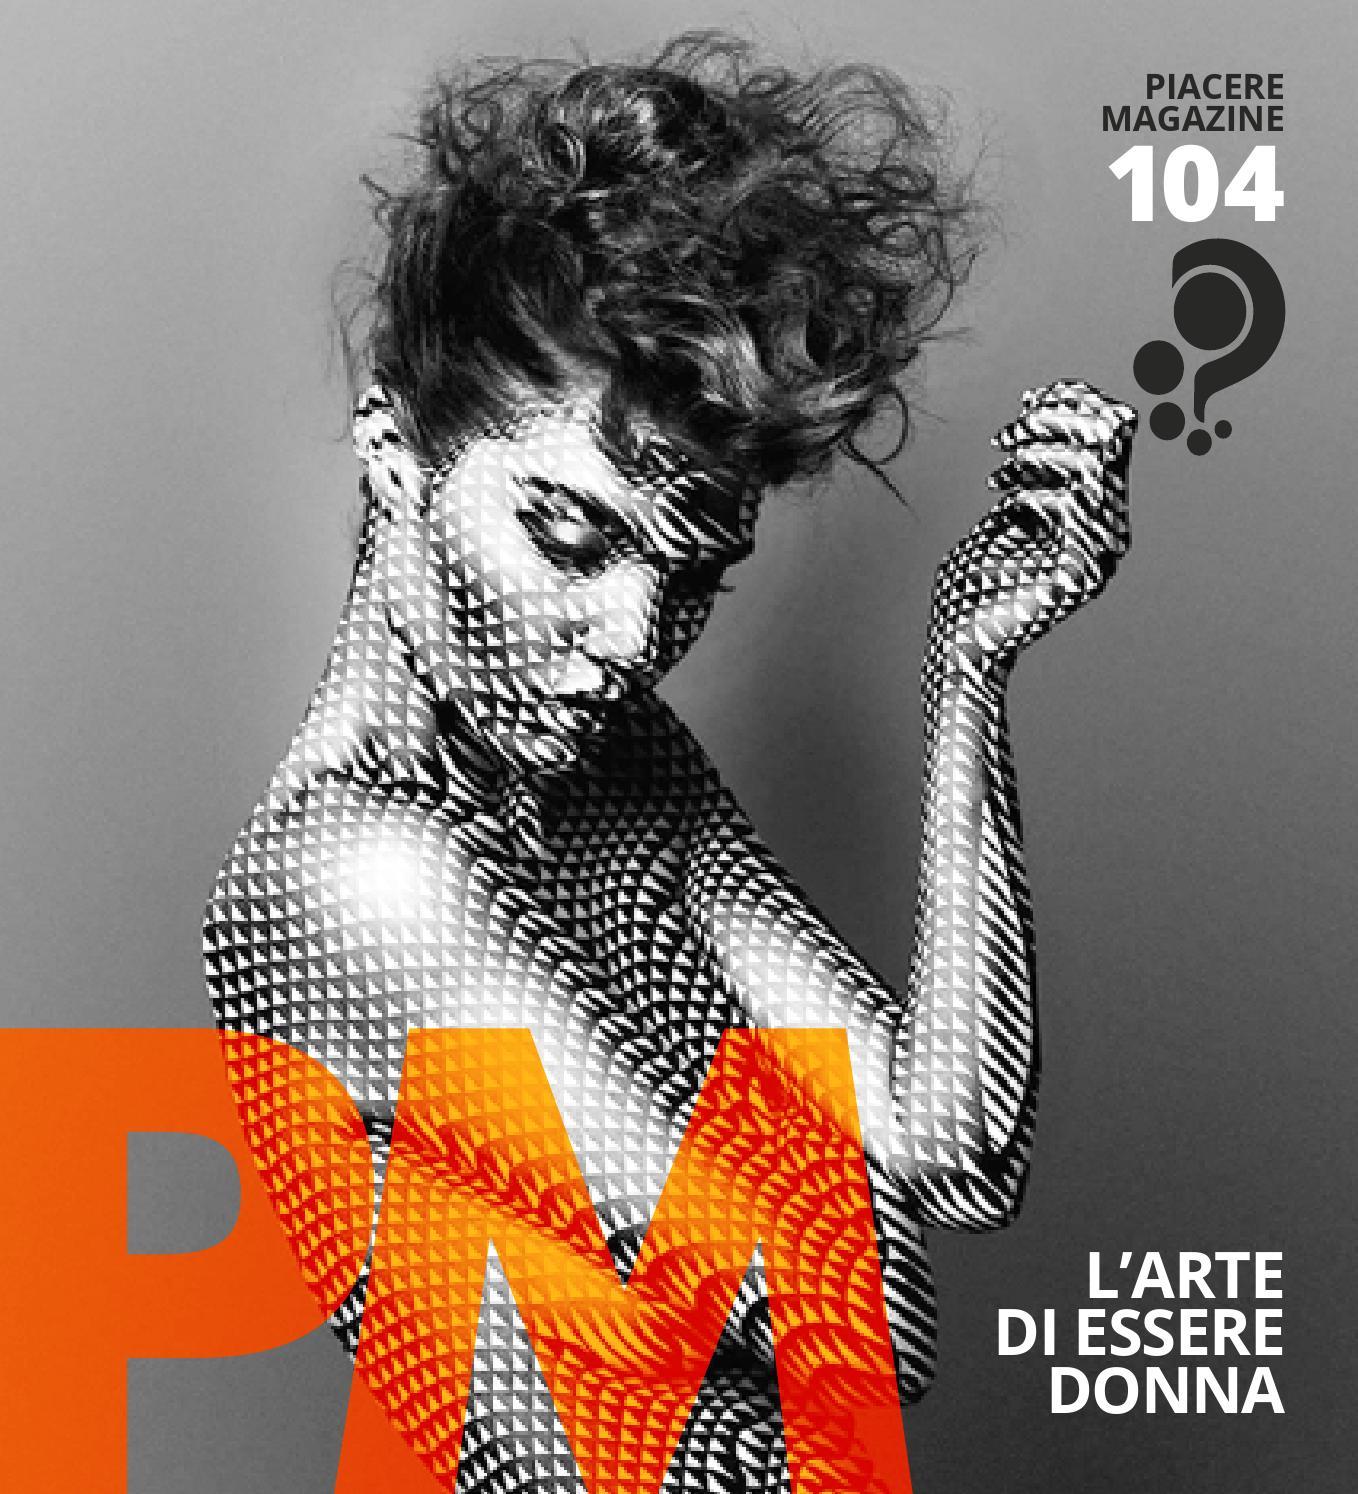 Piacere Magazine n.104   Marzo-Aprile 2016 by PM   Piacere Magazine - issuu 94e2afeffe0